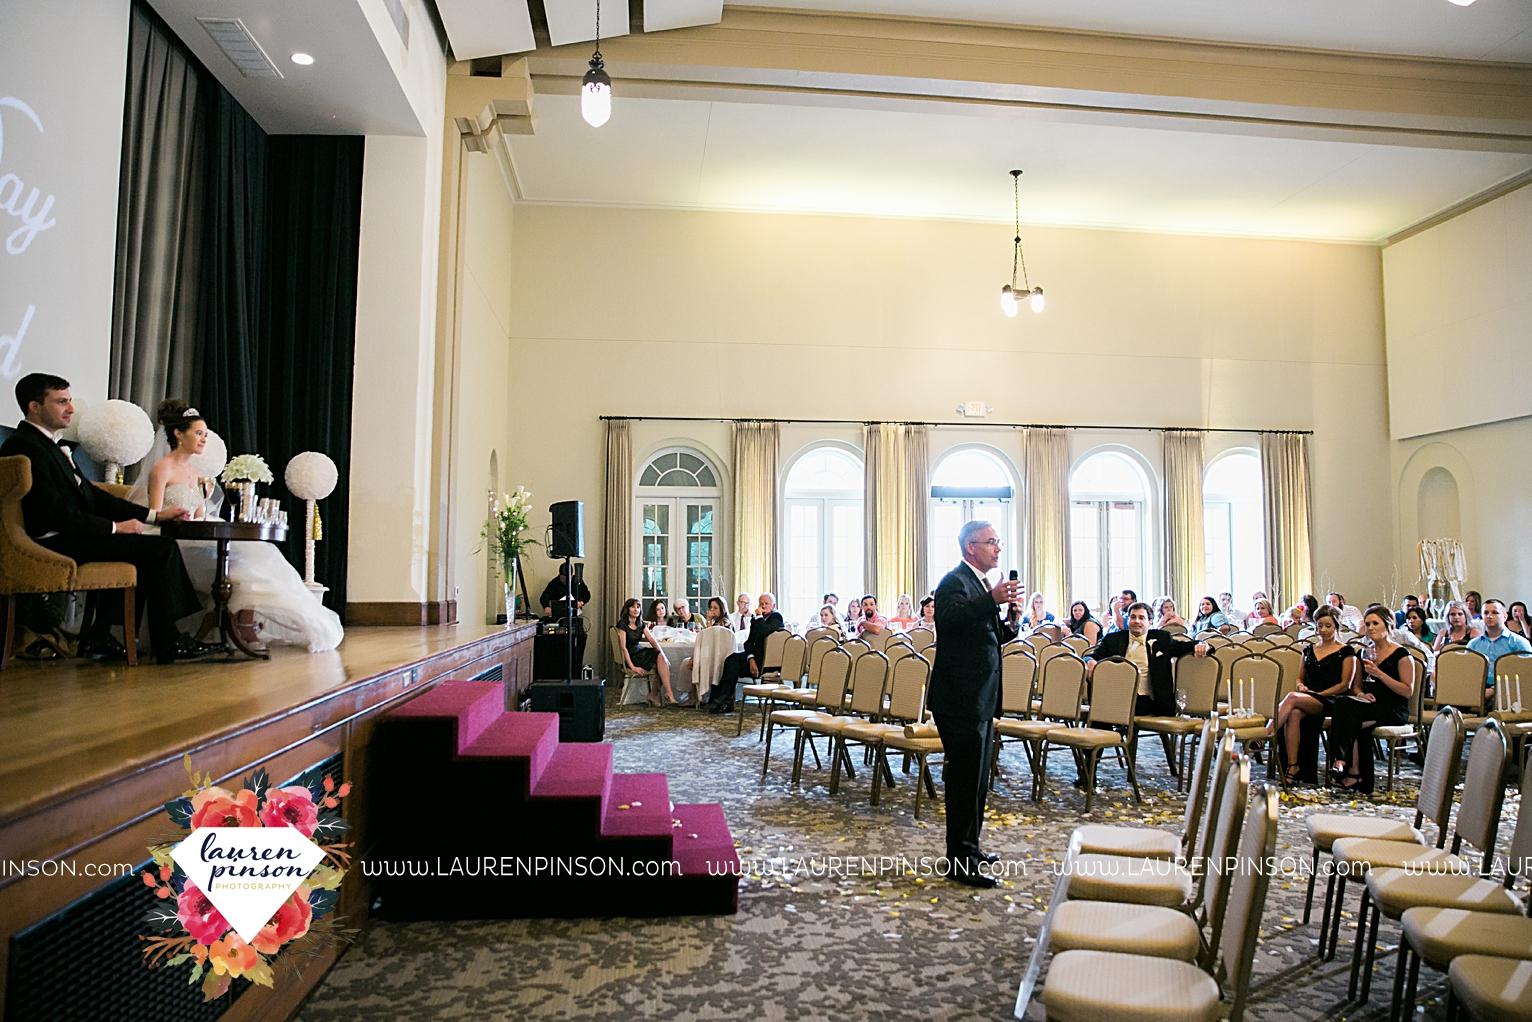 wichita-falls-texas-wedding-photographer-the-forum-by-the-kemp-mayfield-events-ulta-gold-glitter_2877.jpg